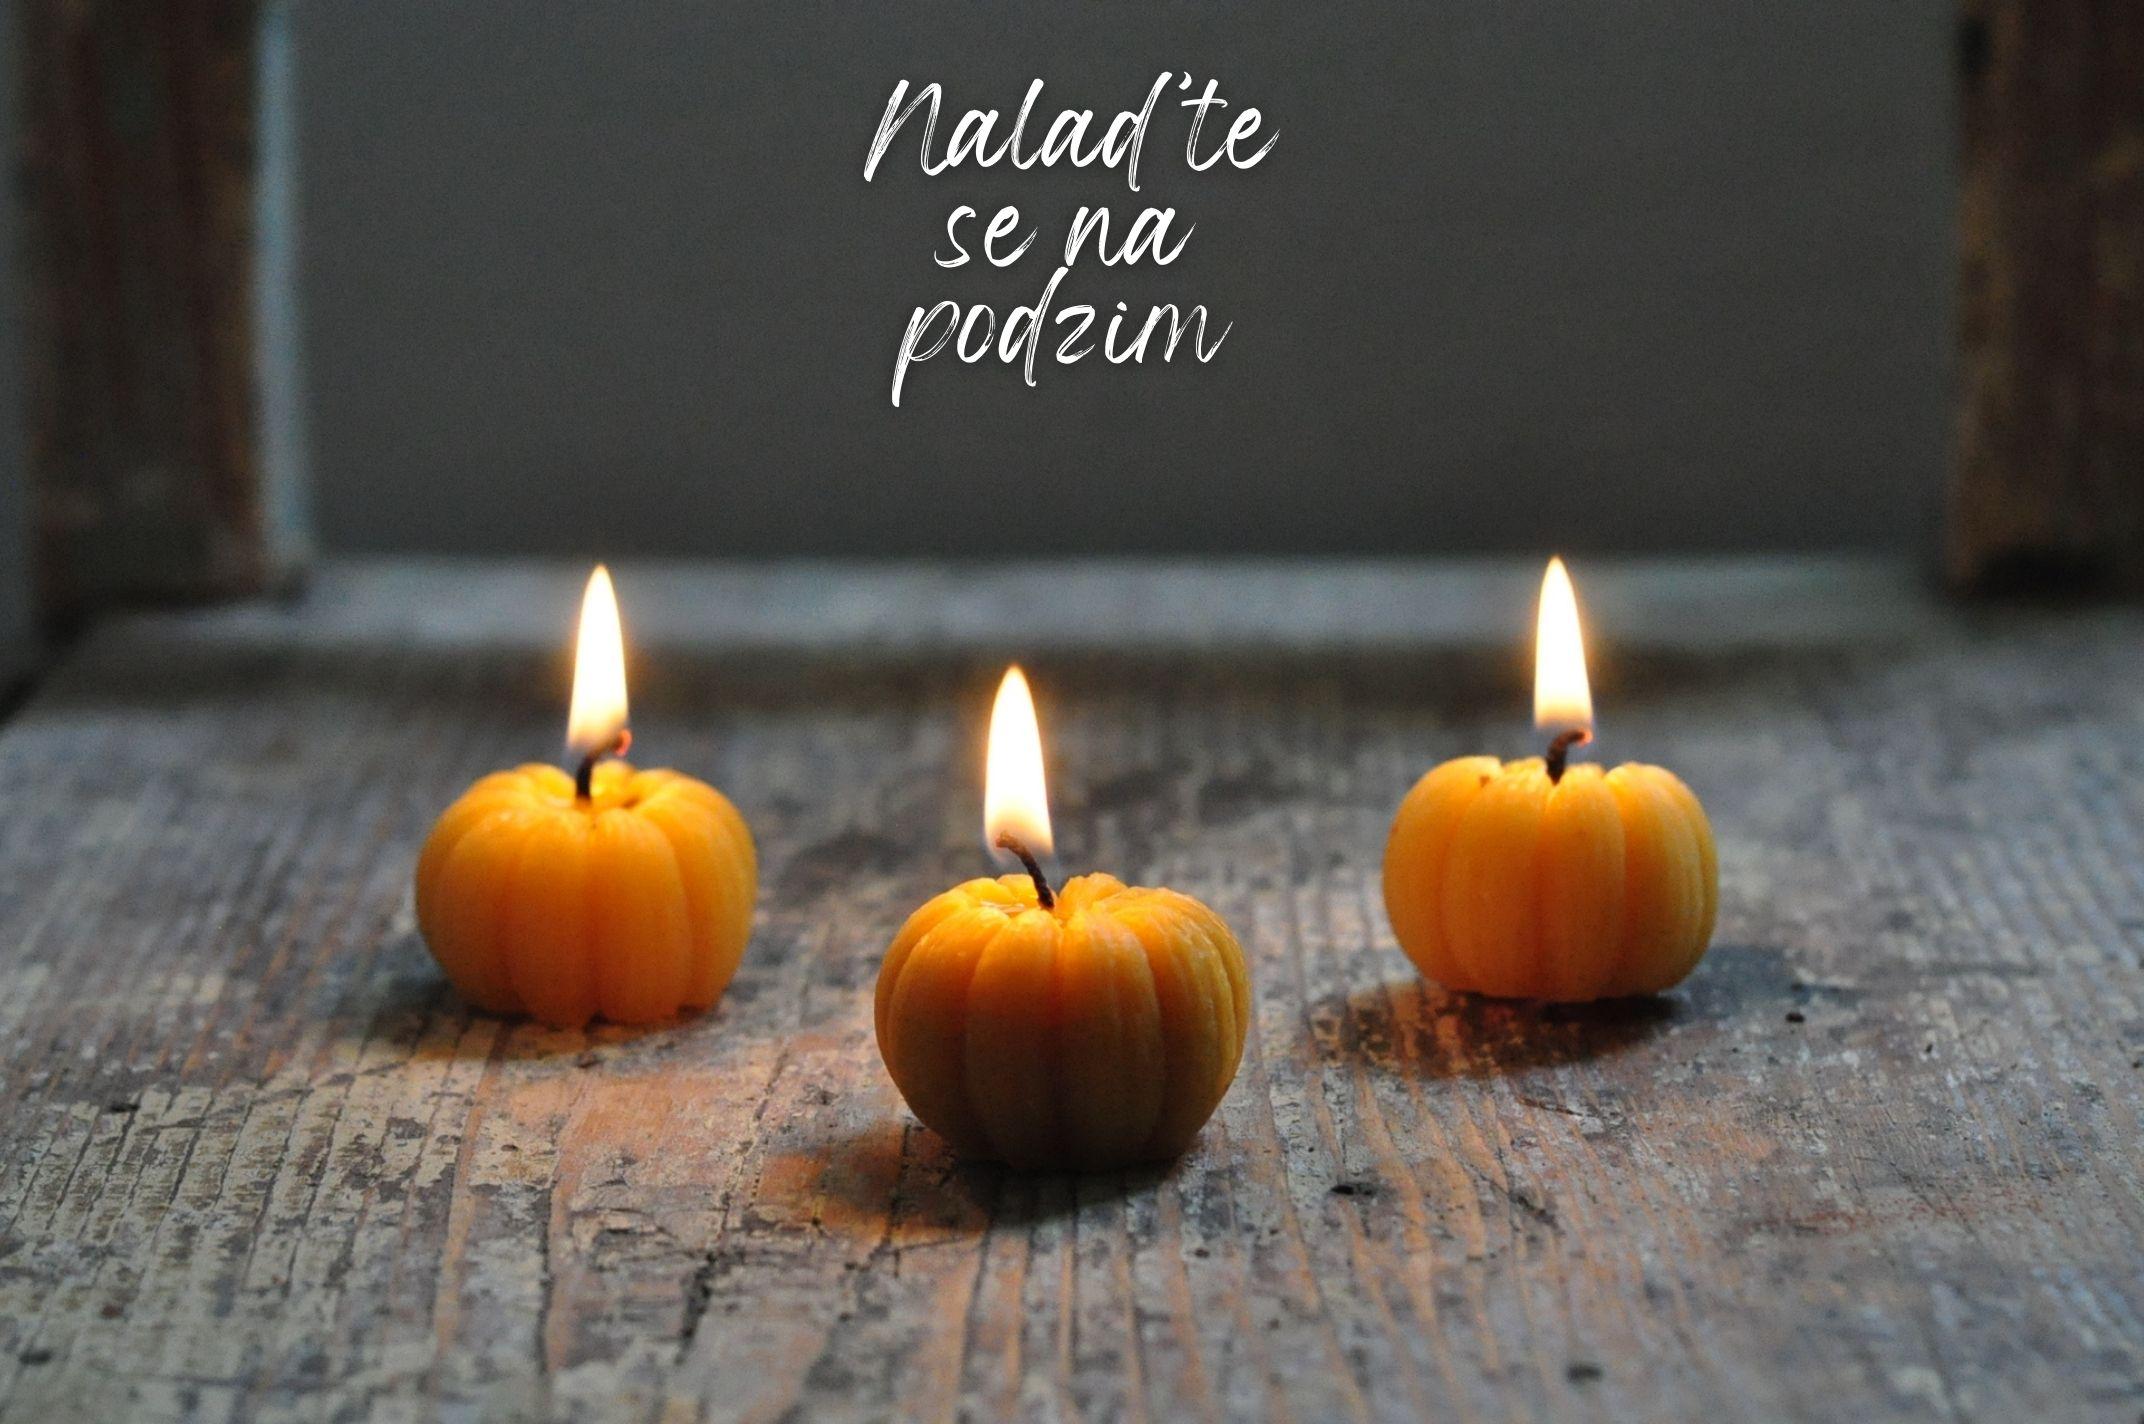 Podzim na Bee Happy candles